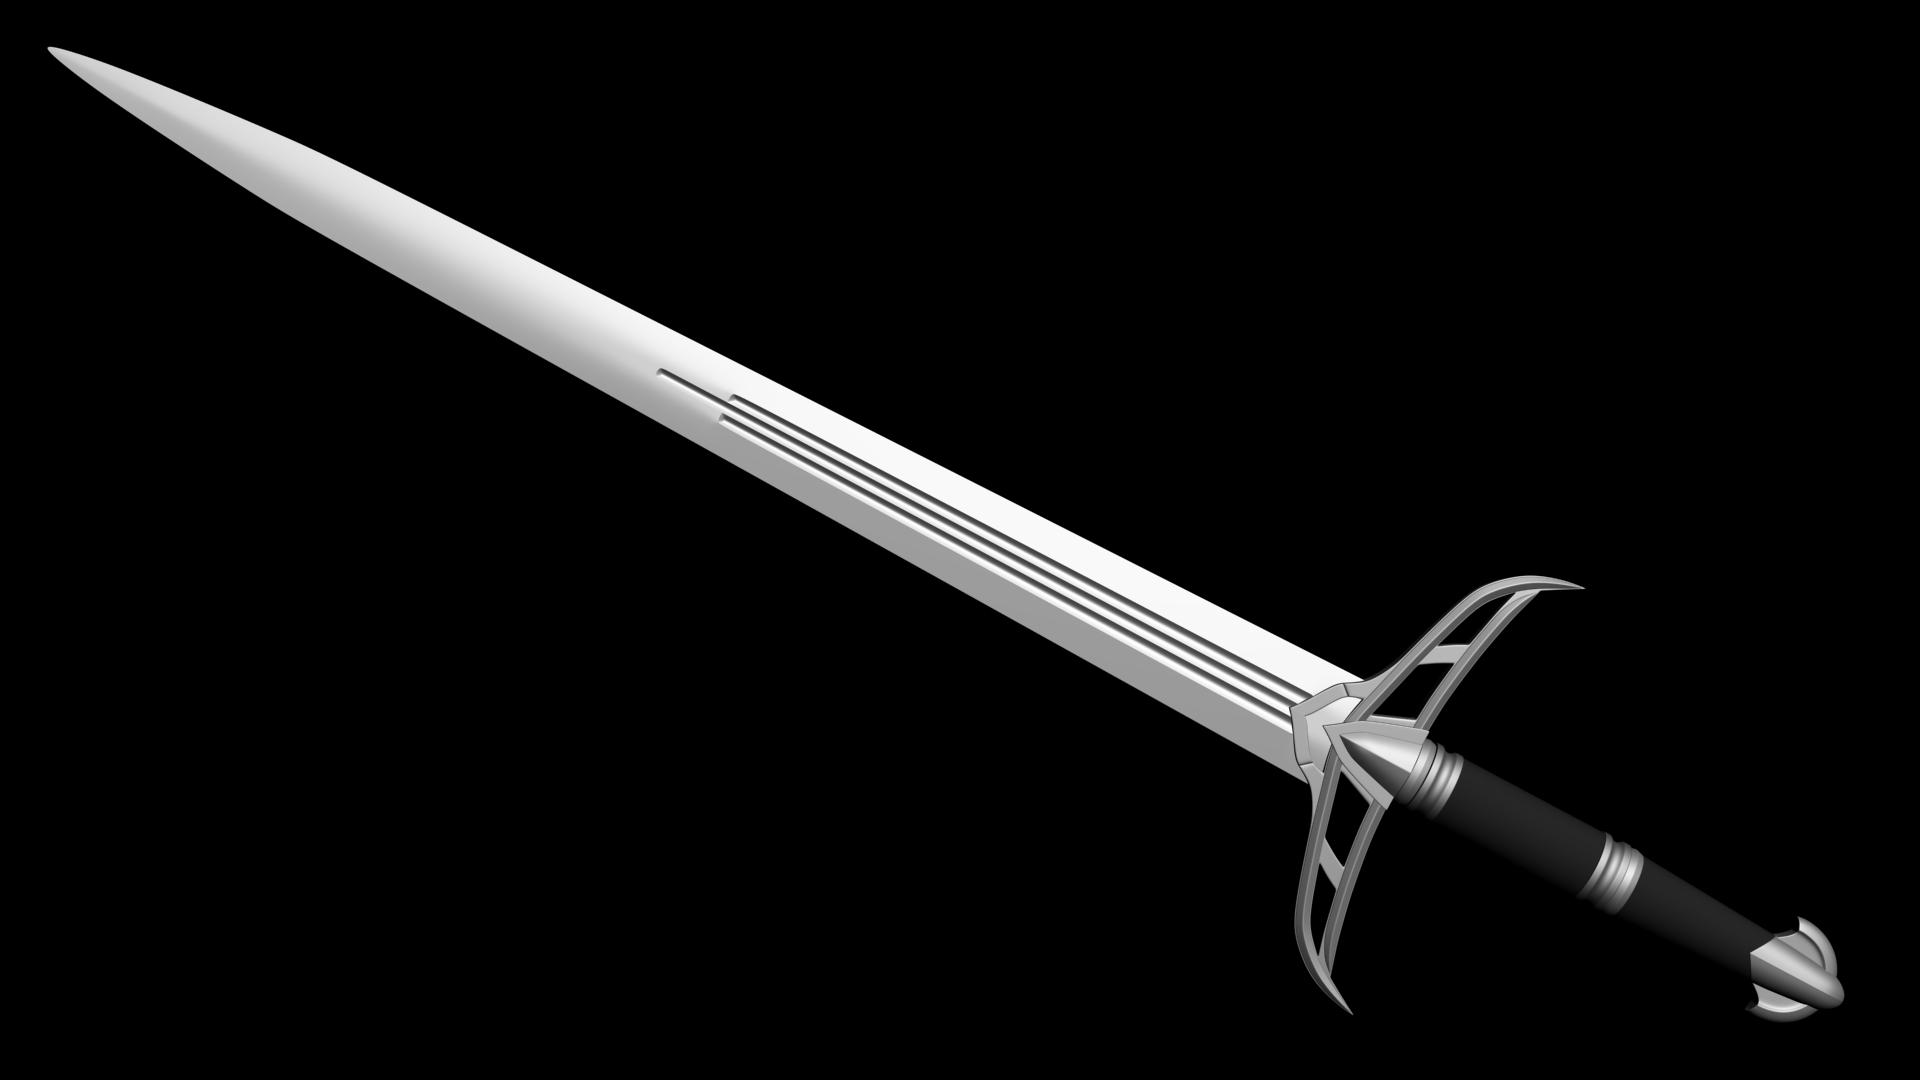 Sword PNG image - PNG Sword